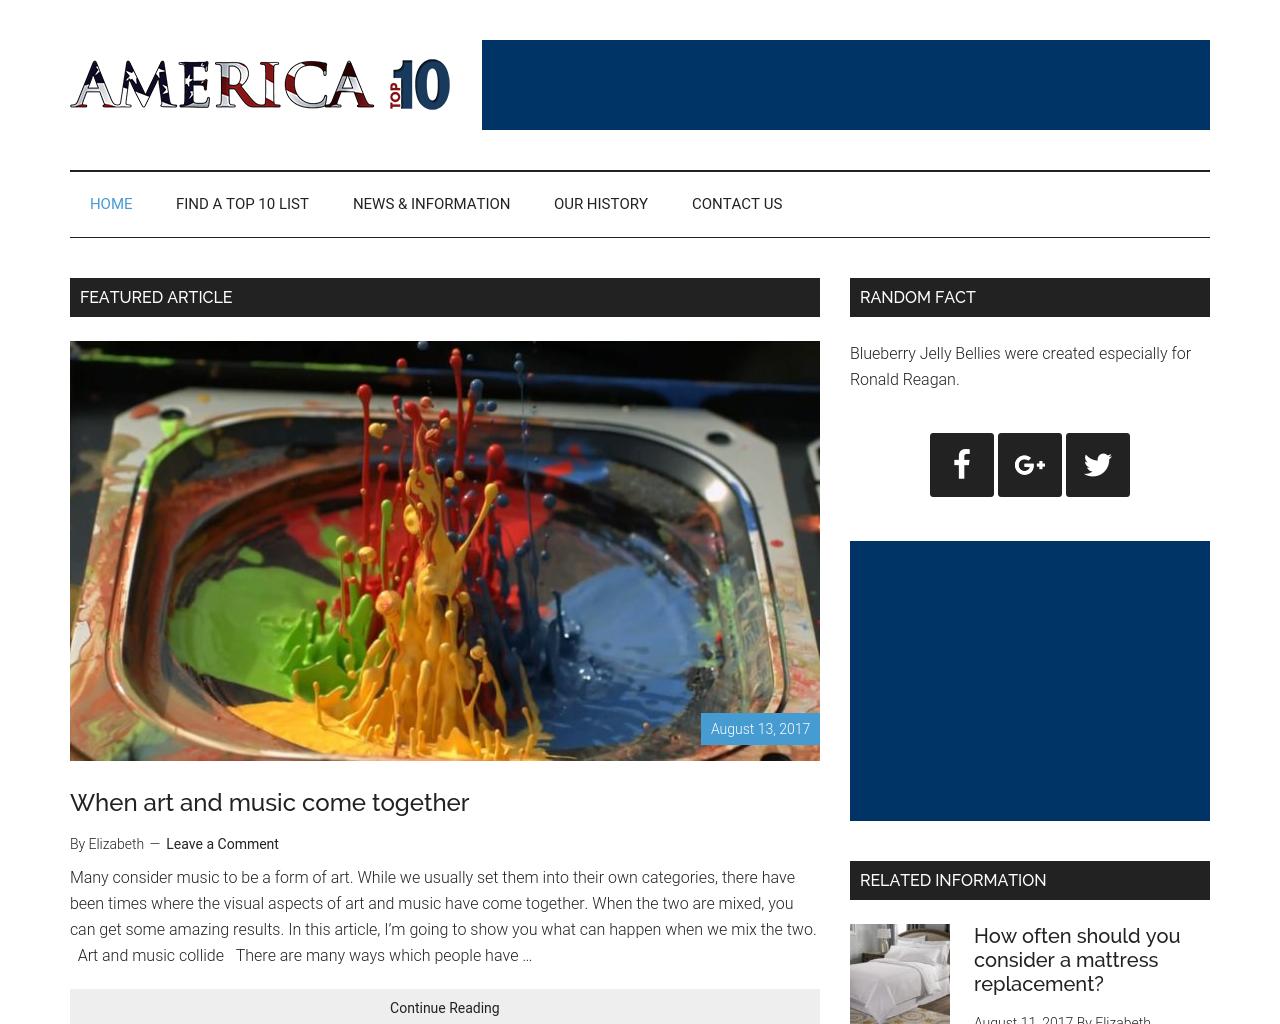 America-Top-10-Advertising-Reviews-Pricing